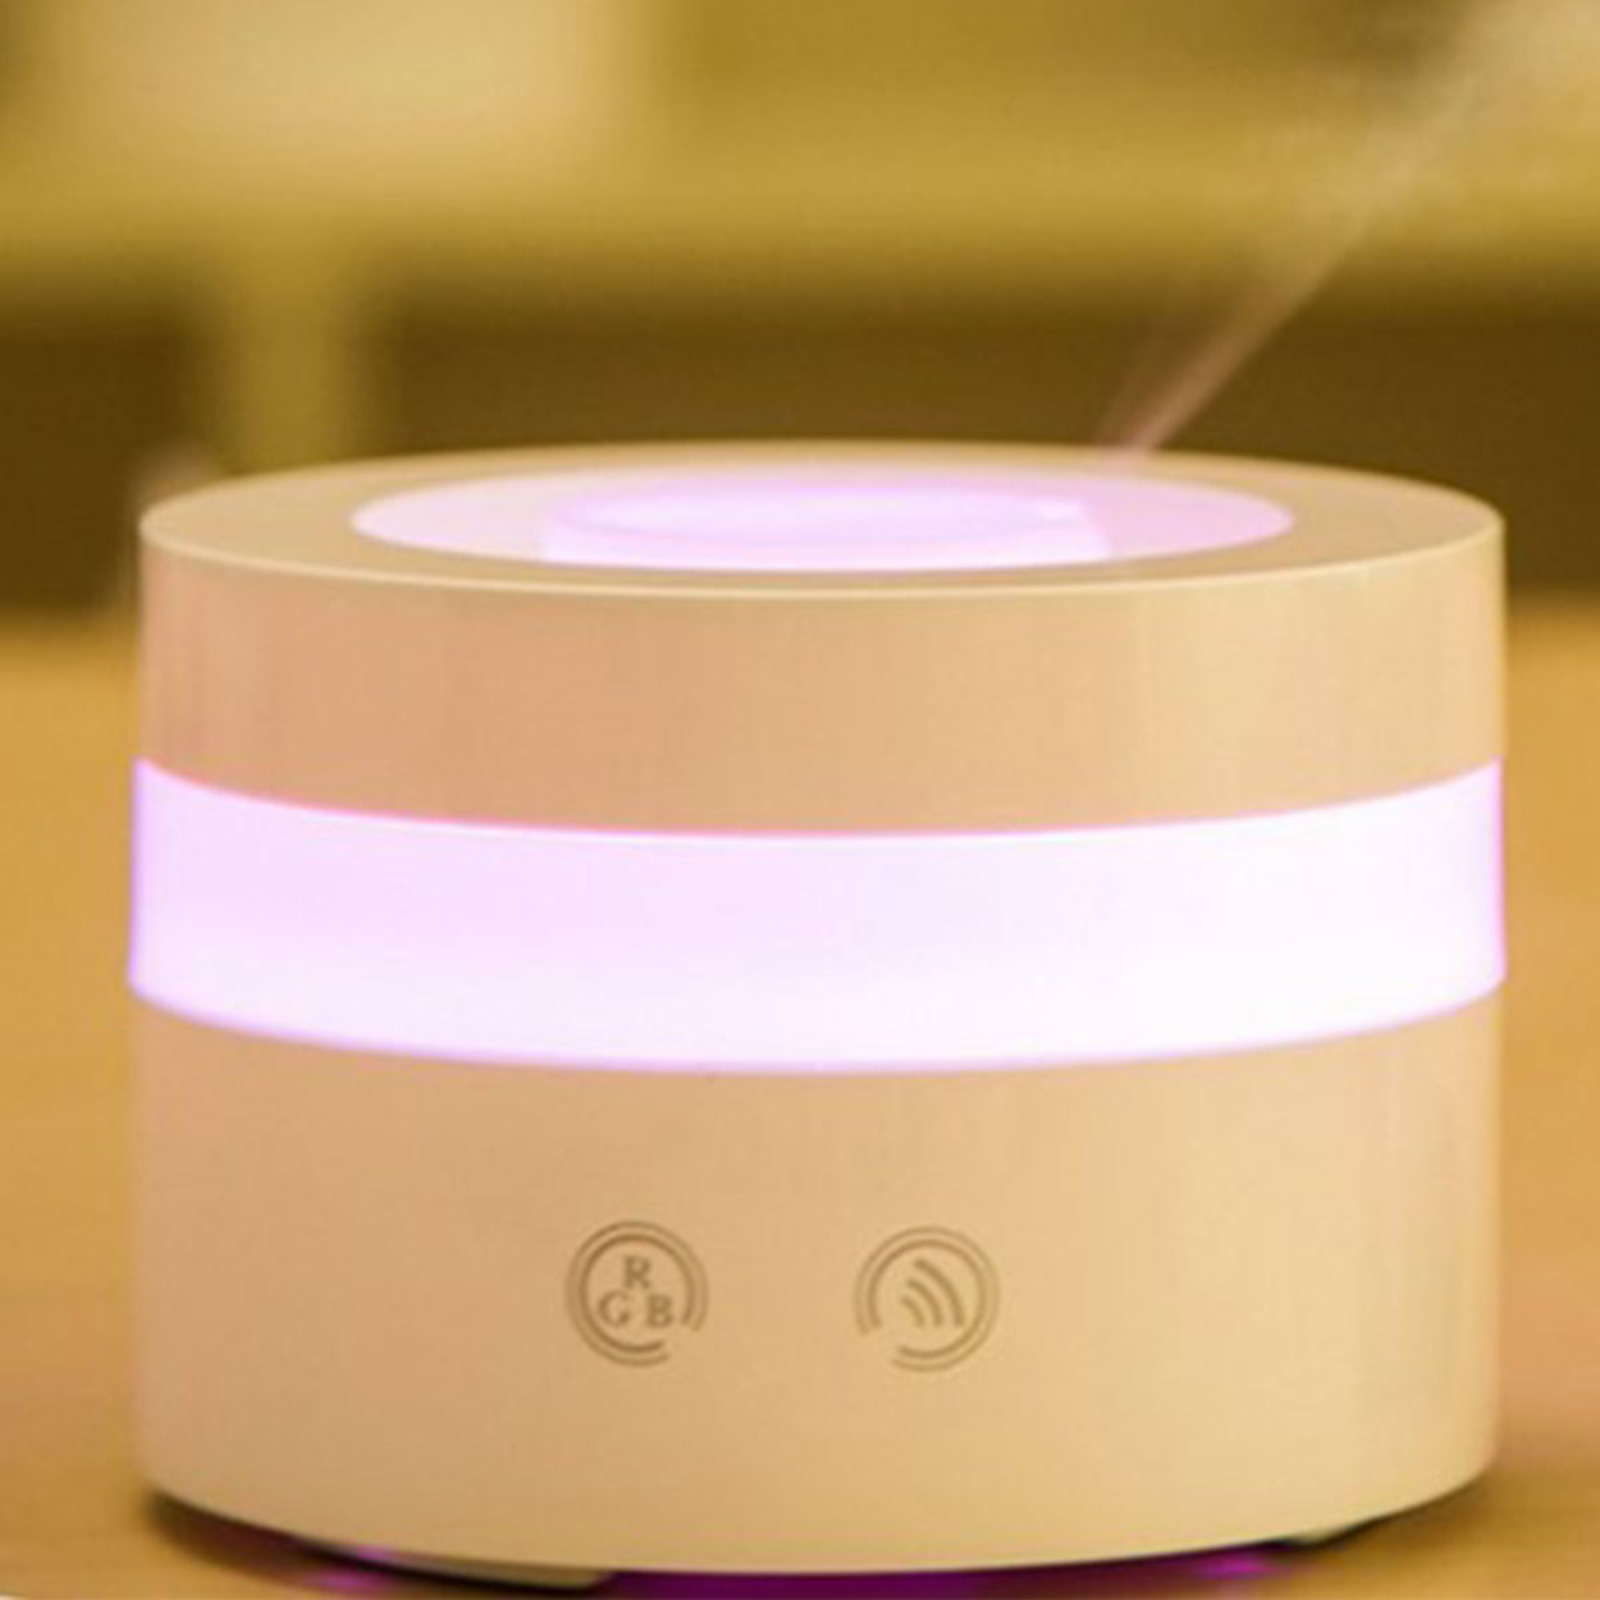 Biofinest U2 Ultrasonic Aroma Diffuser Humidifier